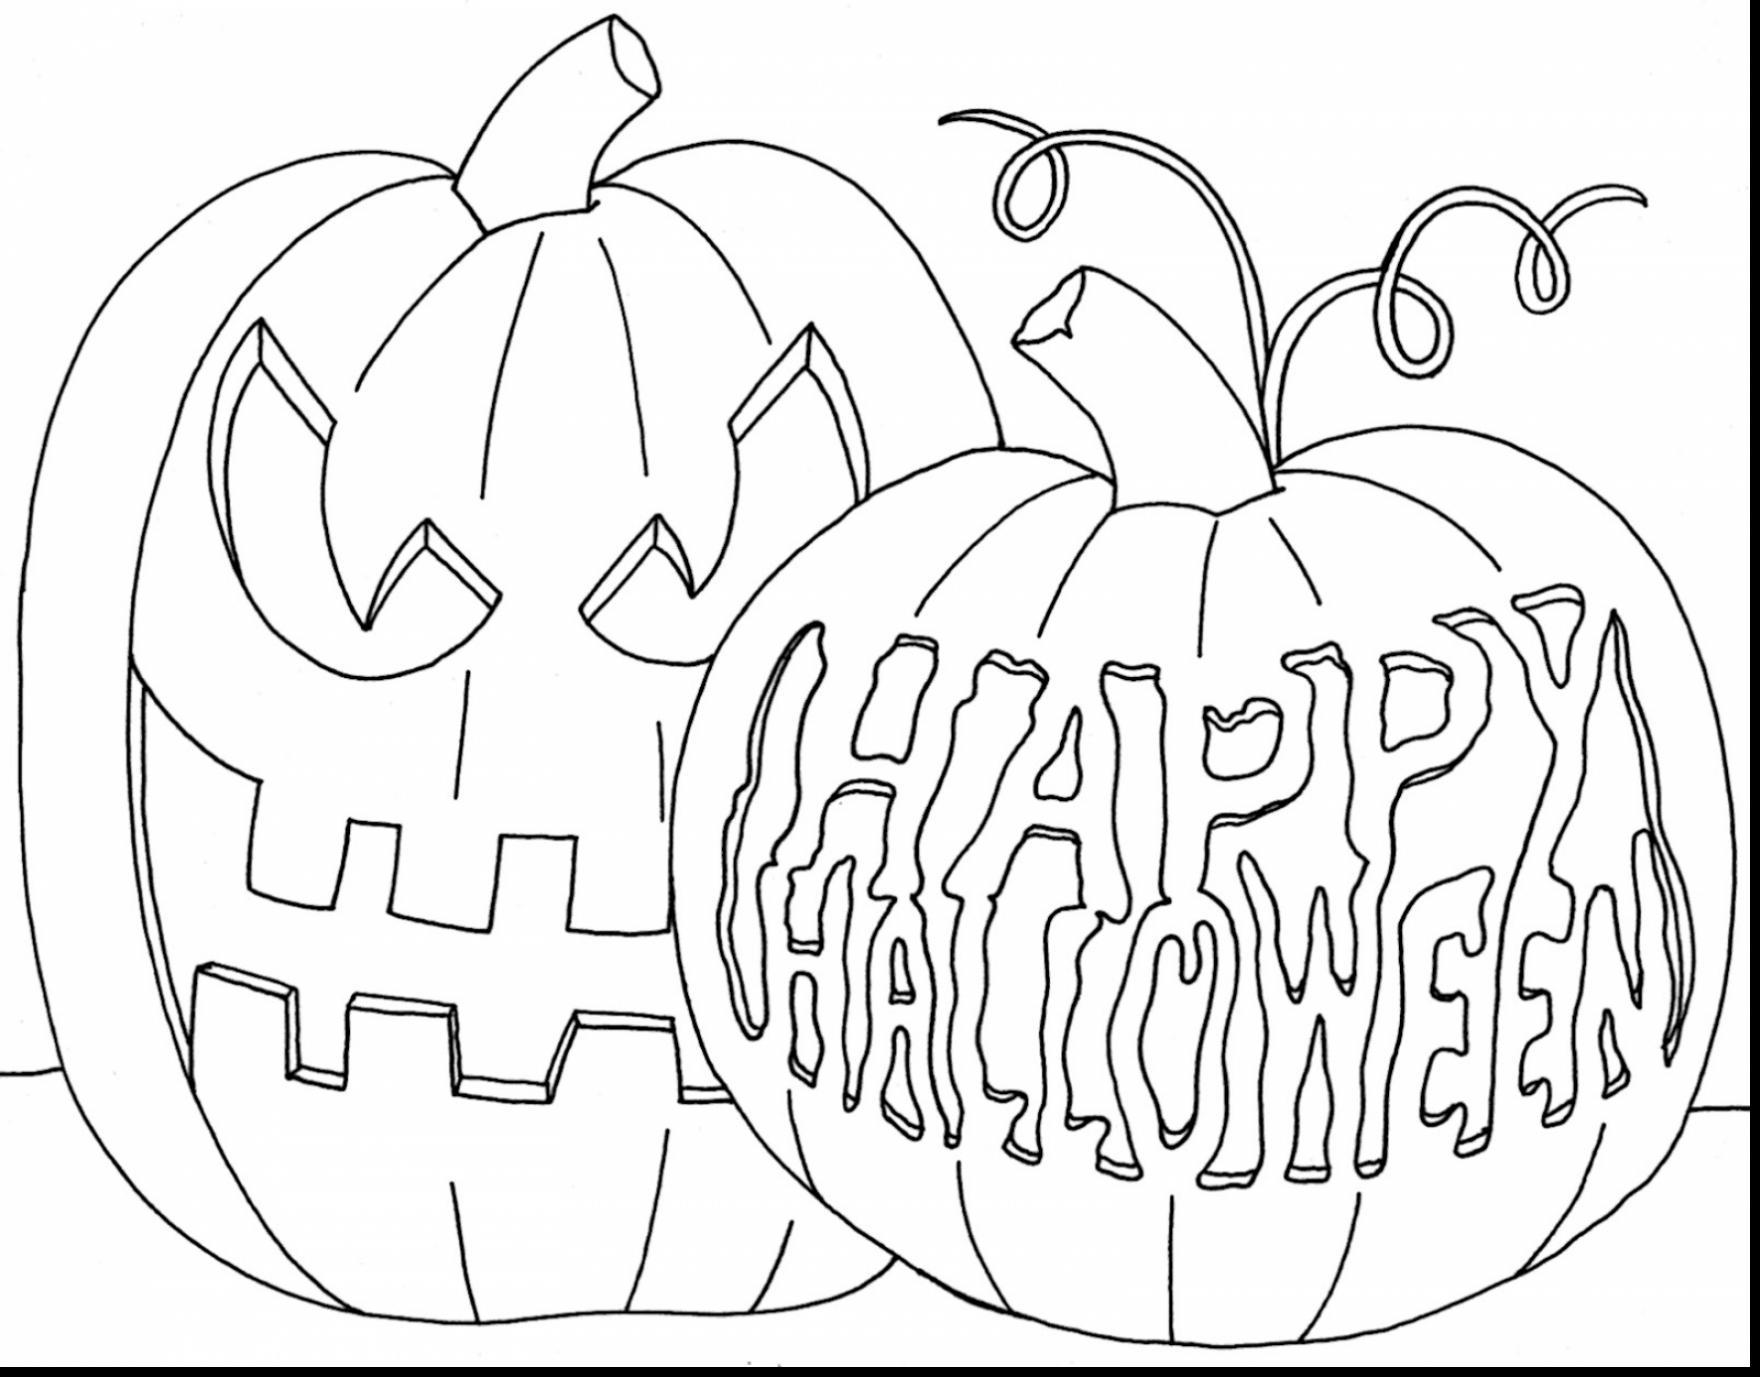 1760x1377 October Coloring Pages October Coloring Pages Printable Free